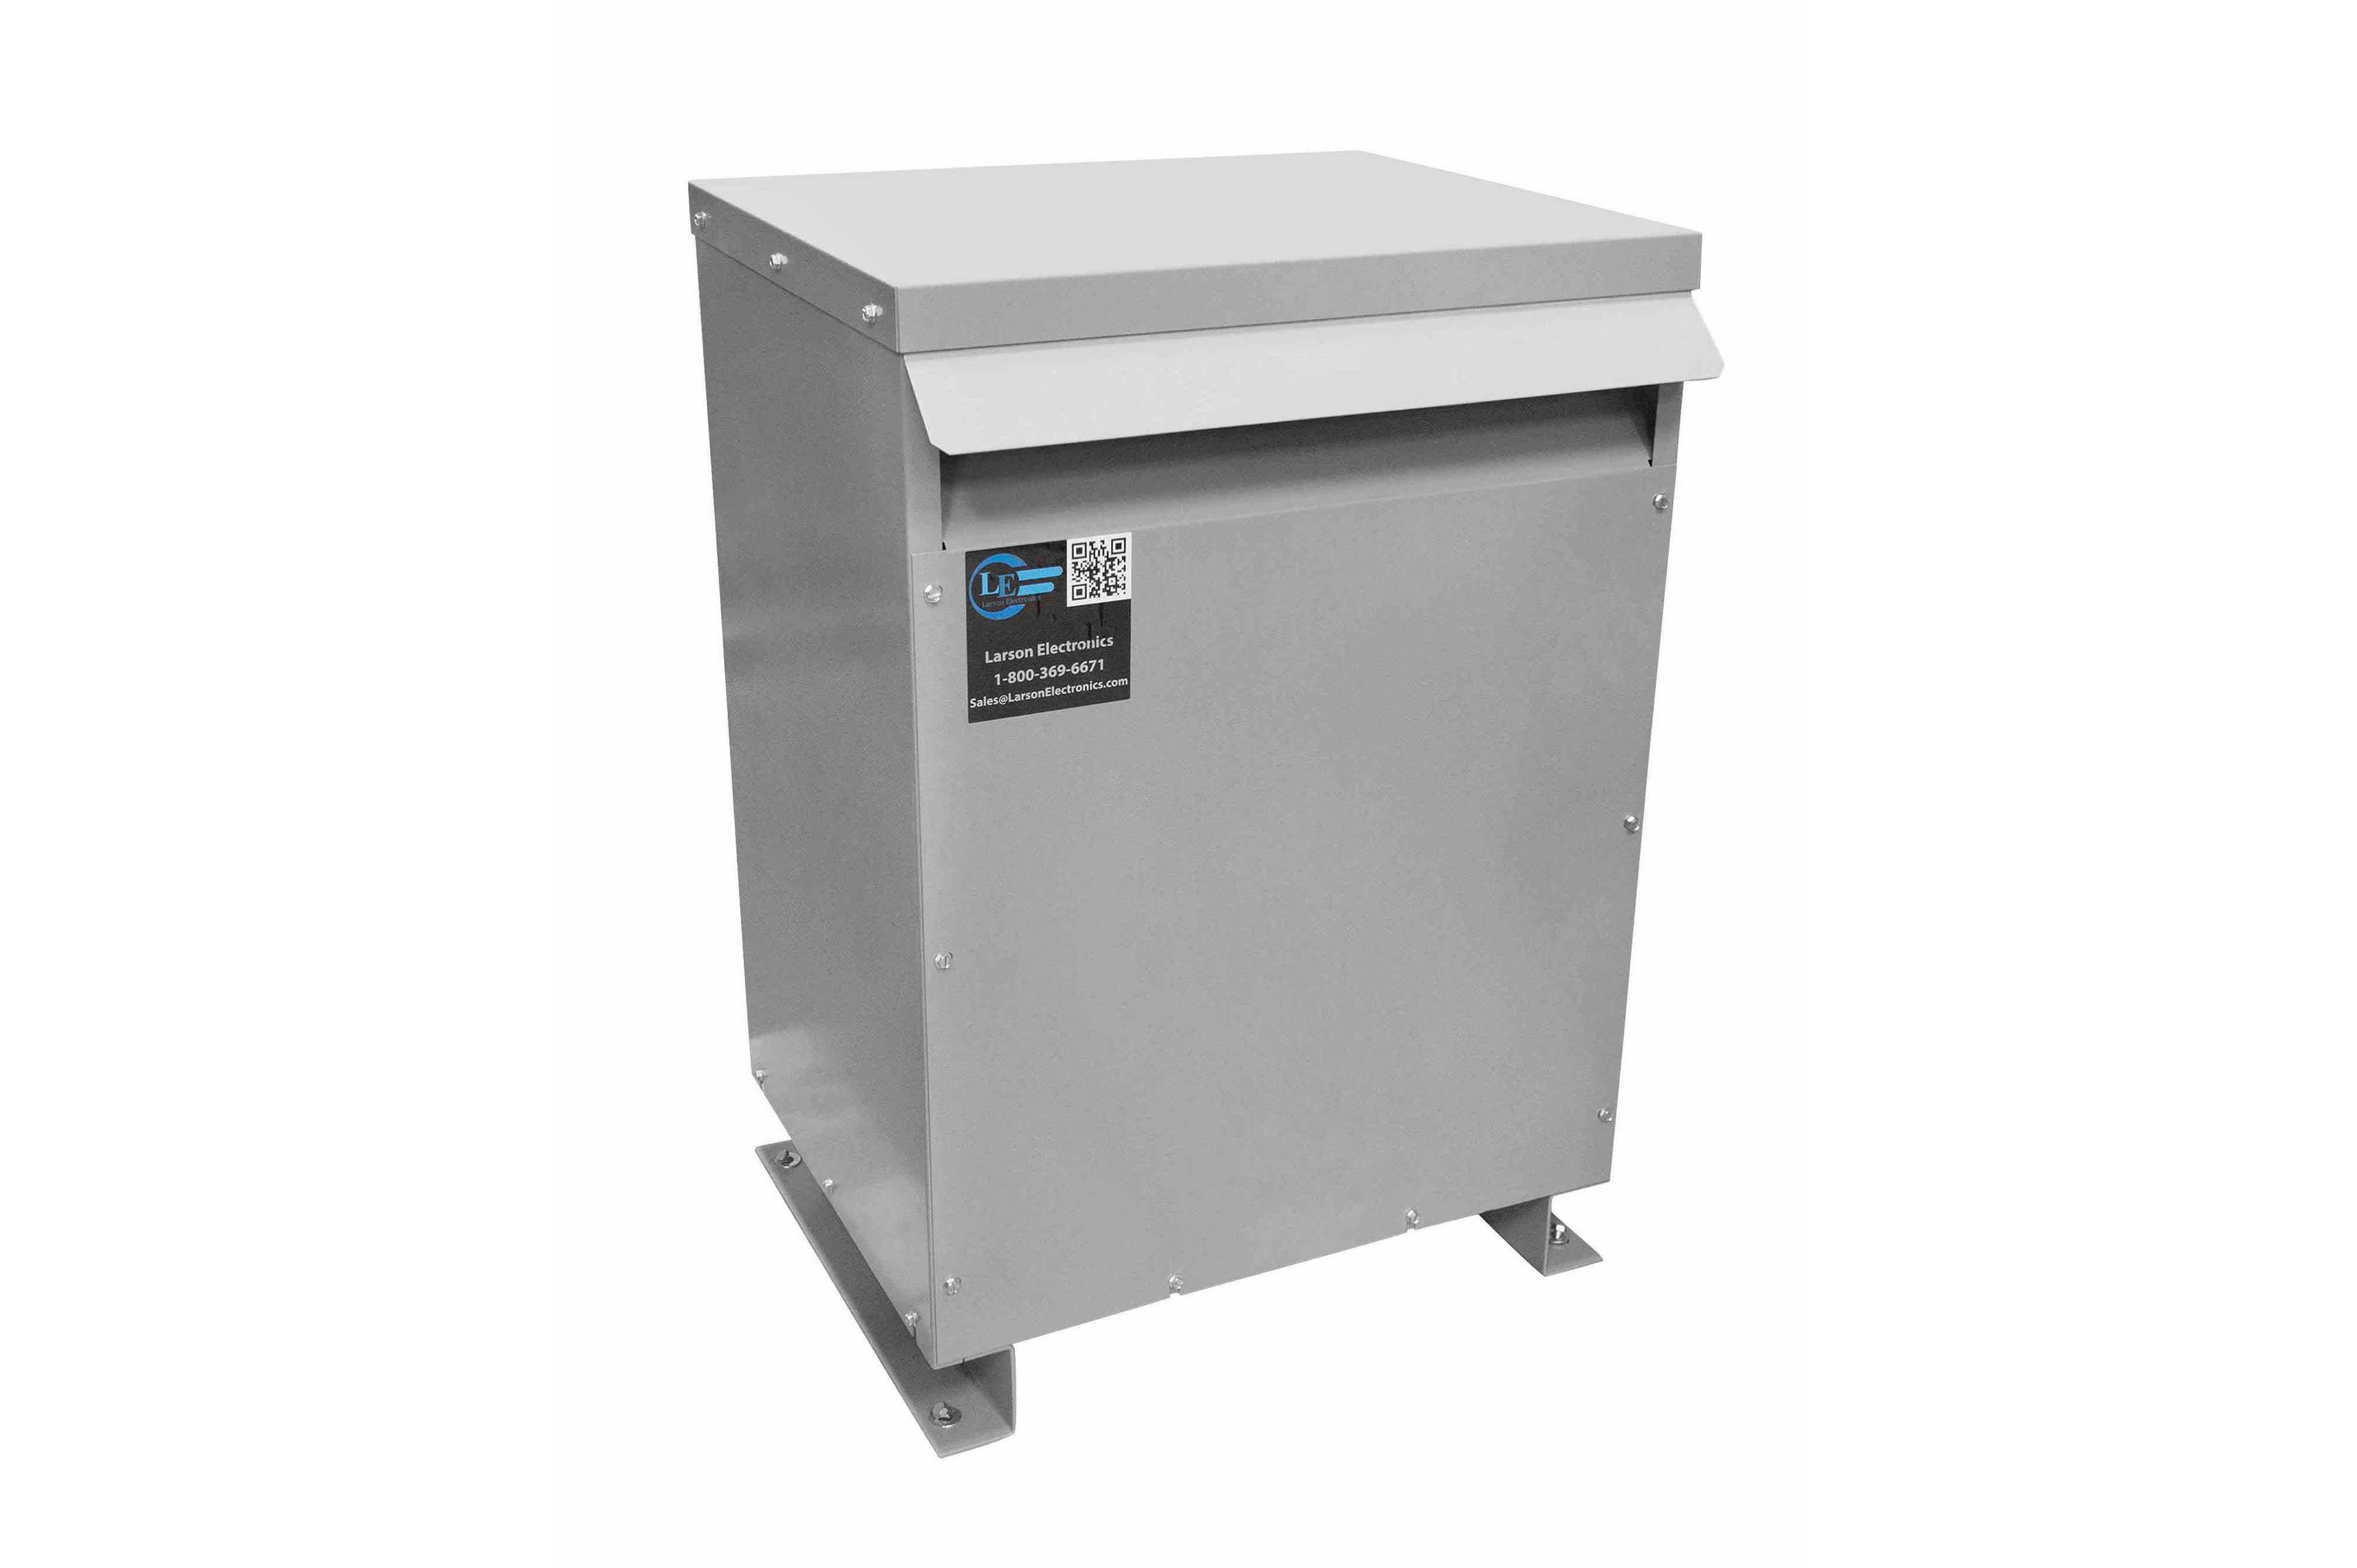 75 kVA 3PH DOE Transformer, 220V Delta Primary, 208Y/120 Wye-N Secondary, N3R, Ventilated, 60 Hz